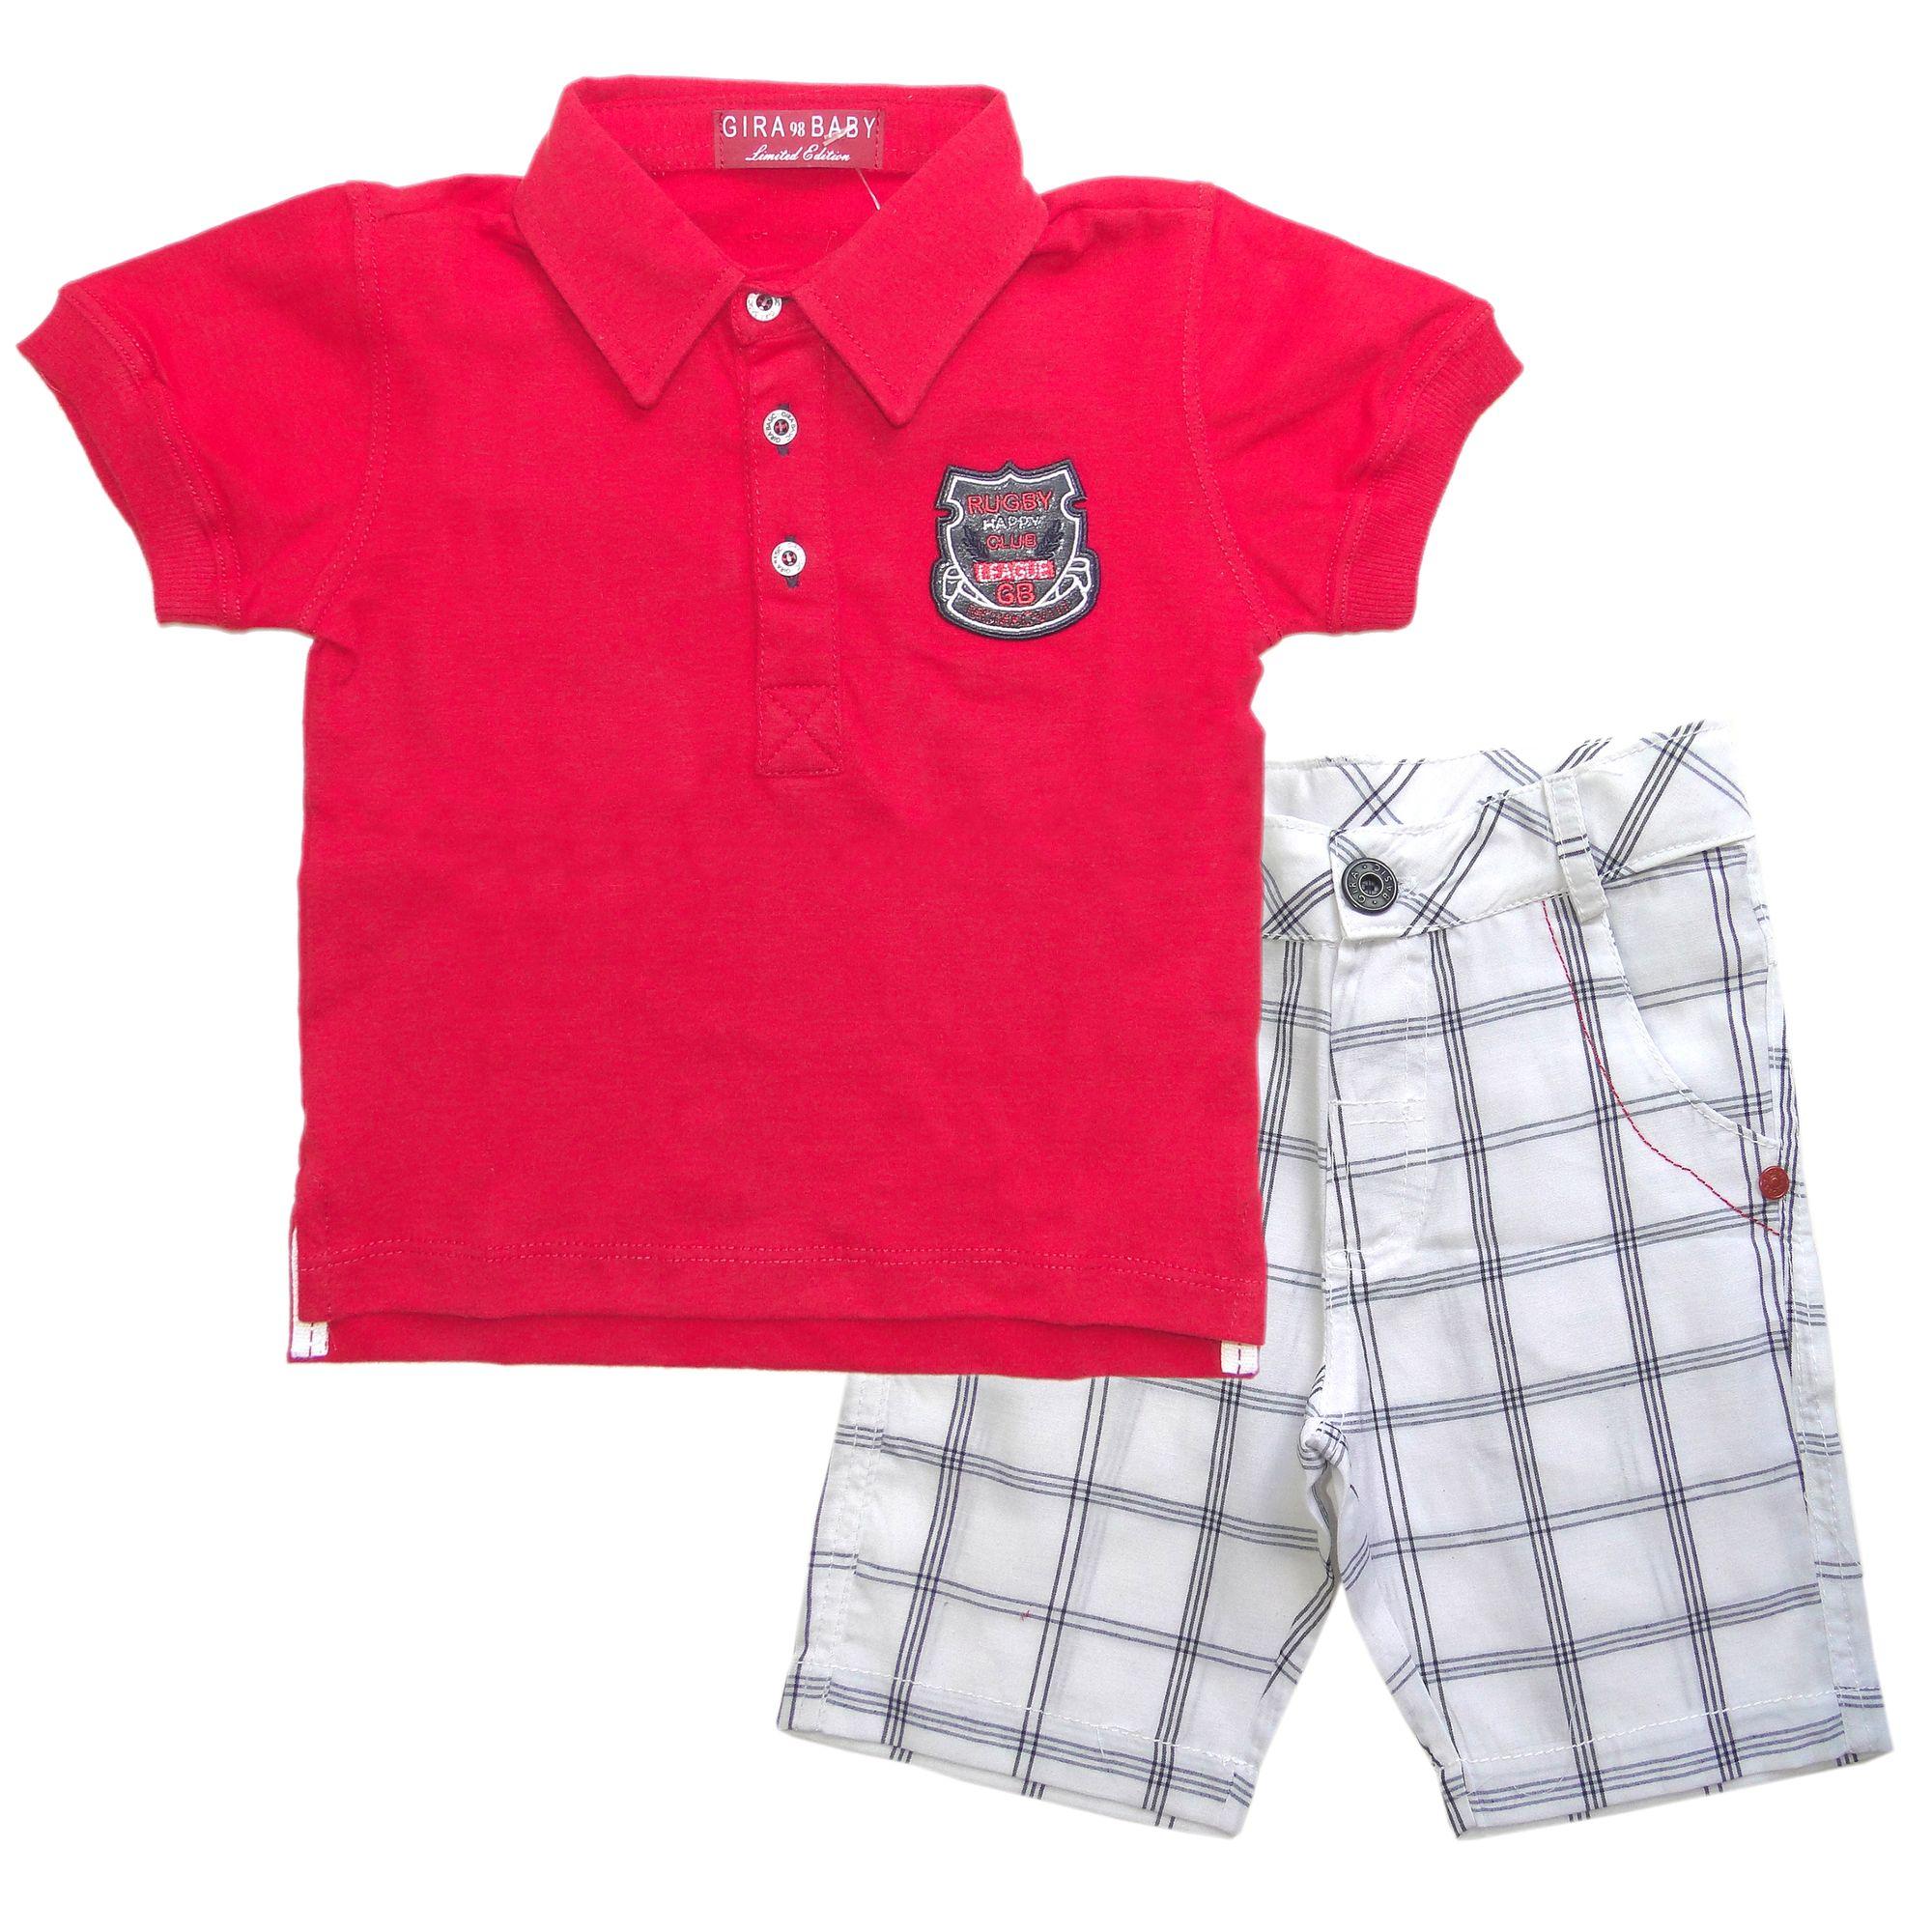 52bbb13d358 Conjunto Infantil Menino Polo Vermelha e Bermuda Xadrez - Roupas ...